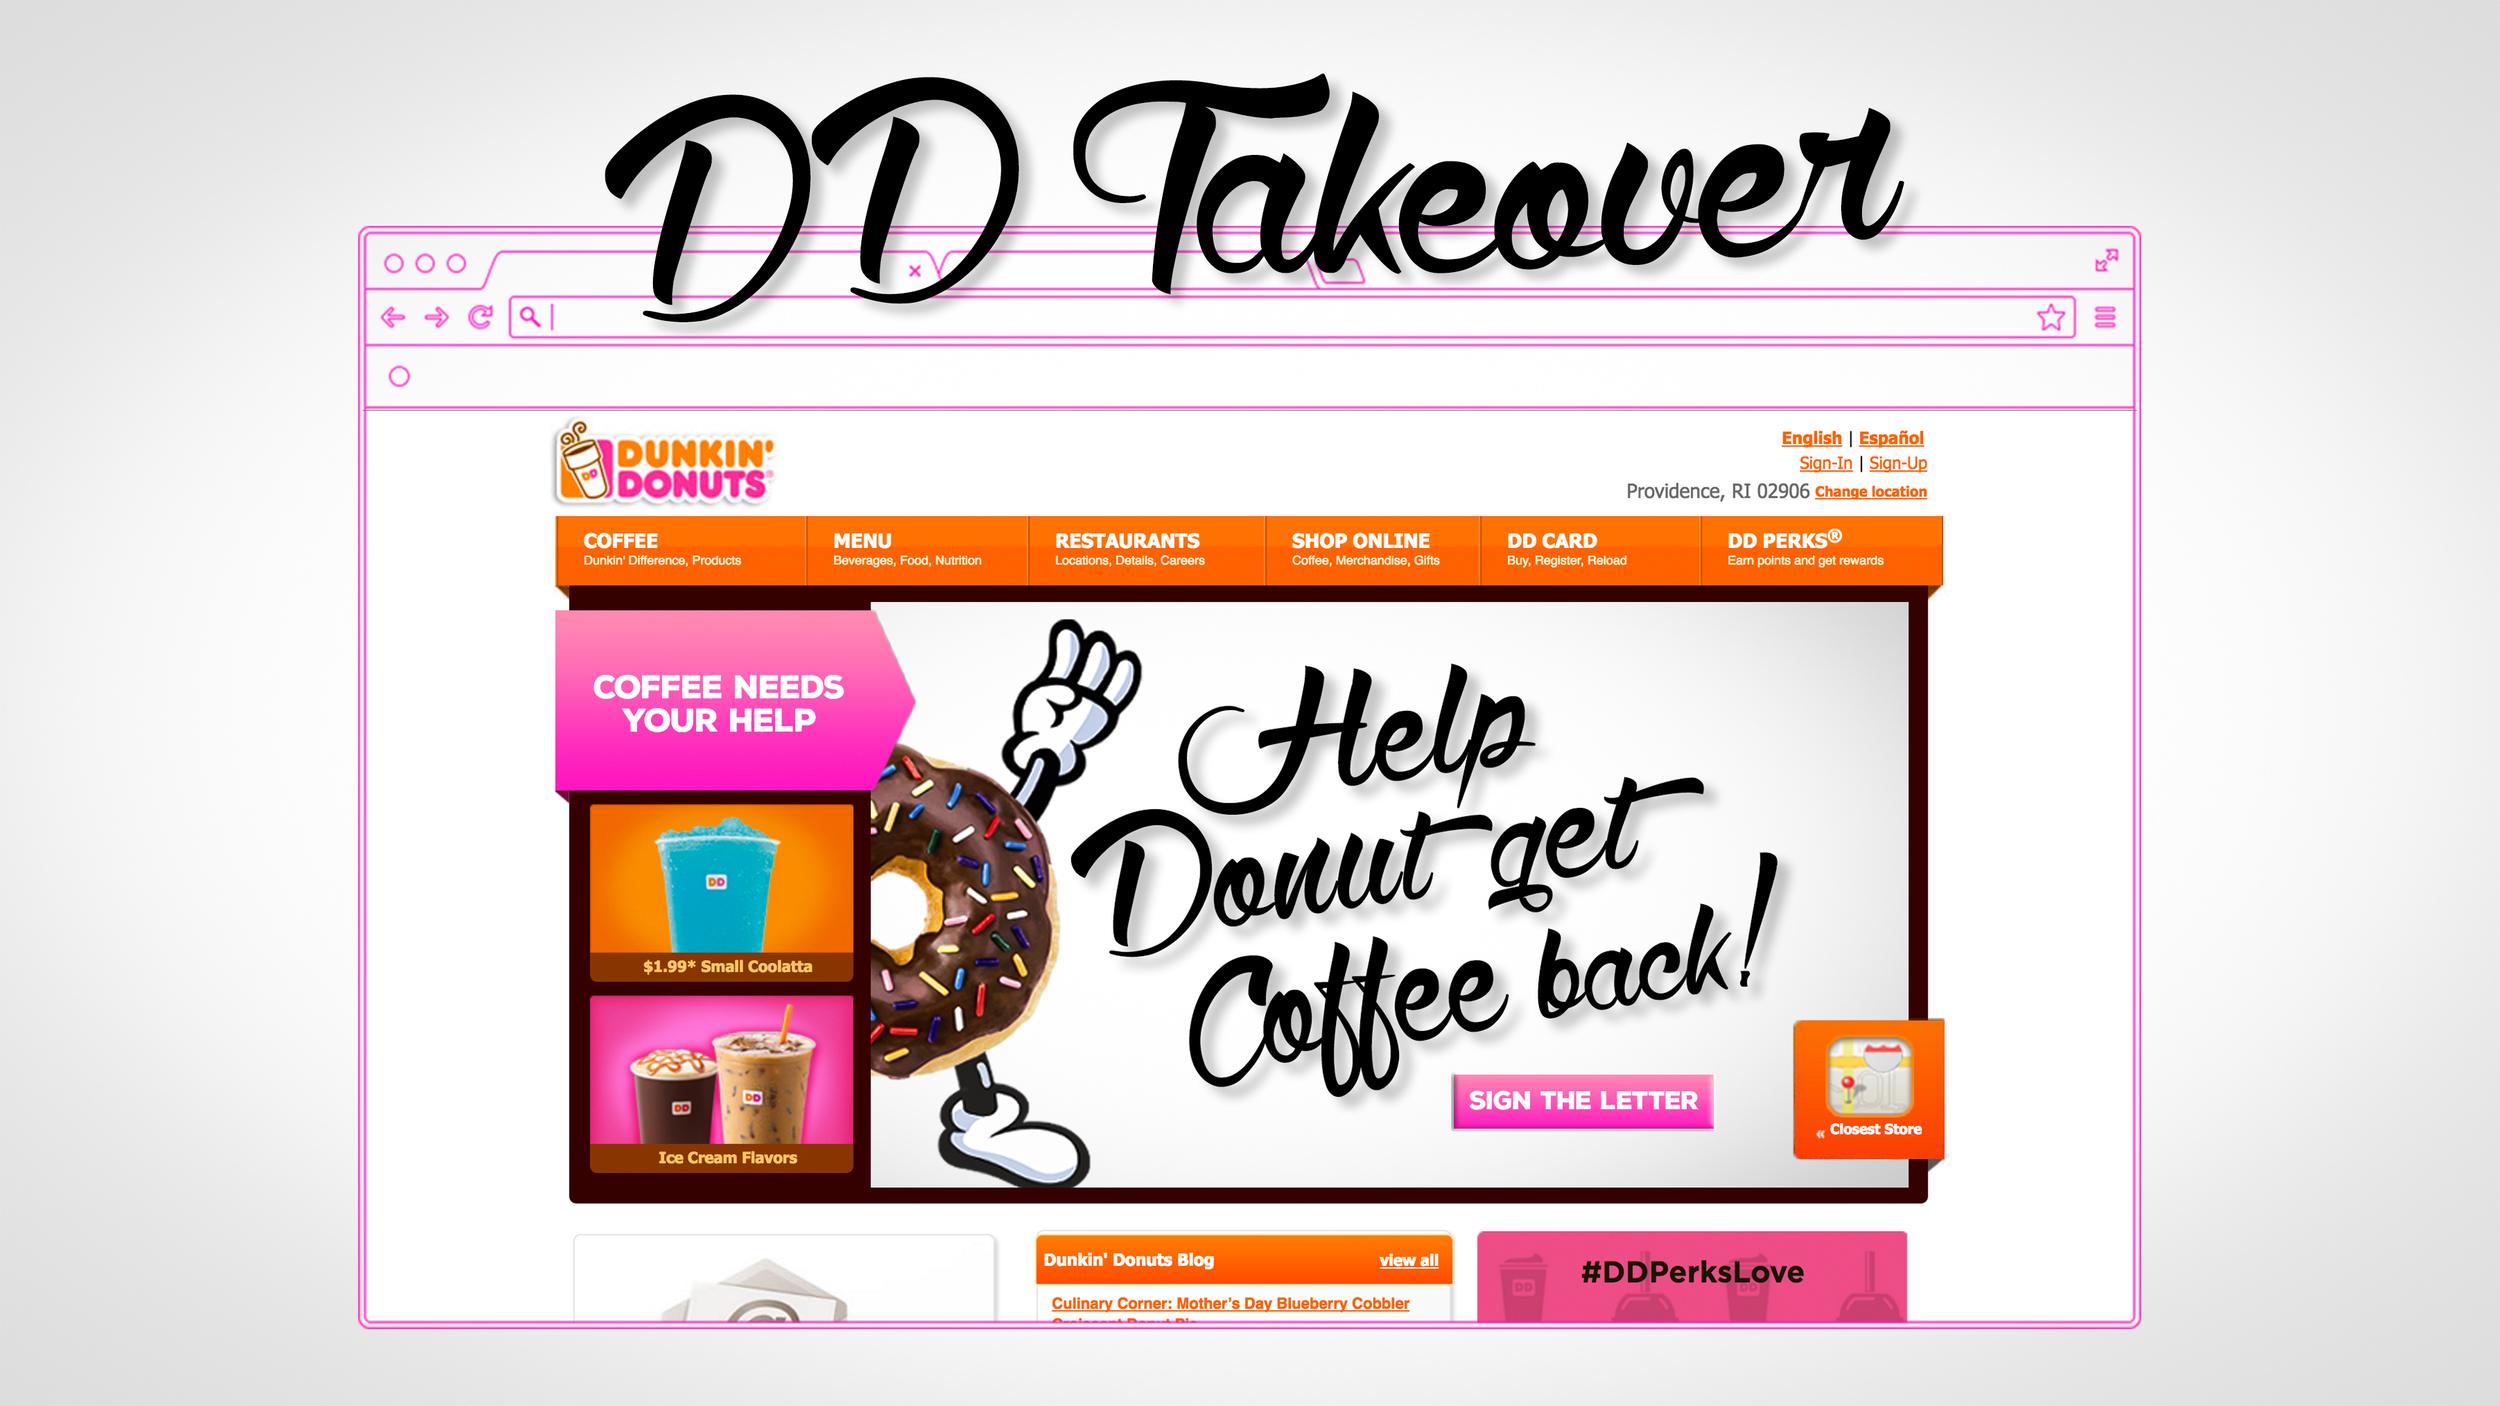 Dunkin Donuts Final Deck_Page_11.jpg